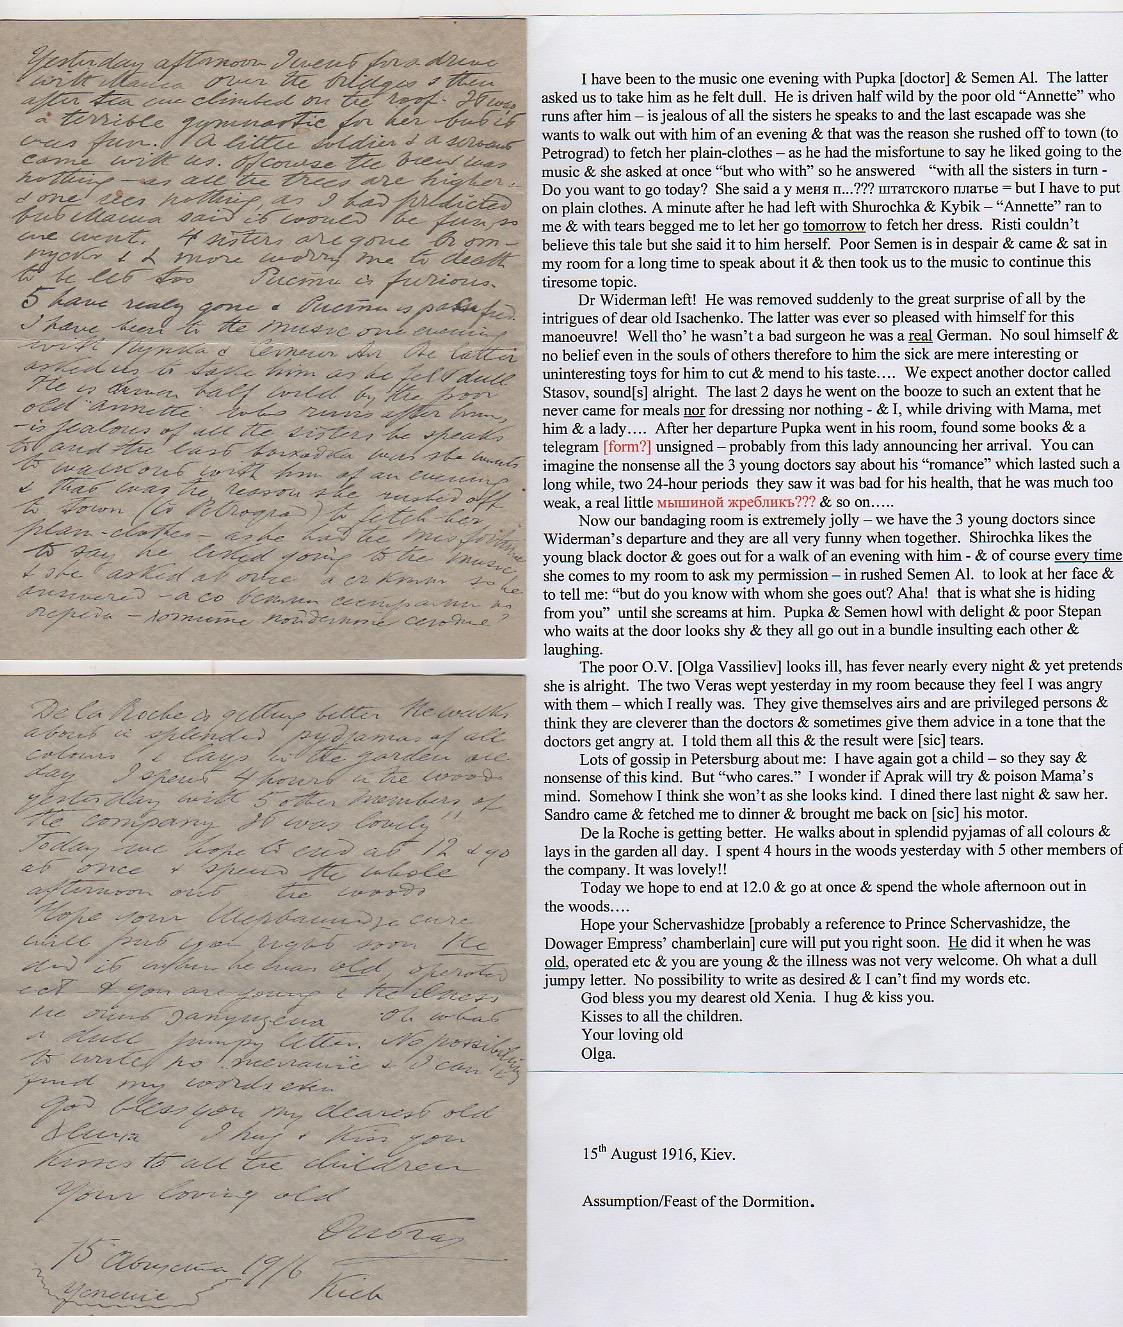 Royalty Grand Duchess Olga Correspondence To Her Sister Grand Duchess Xenia 1916-1920 - Image 25 of 47